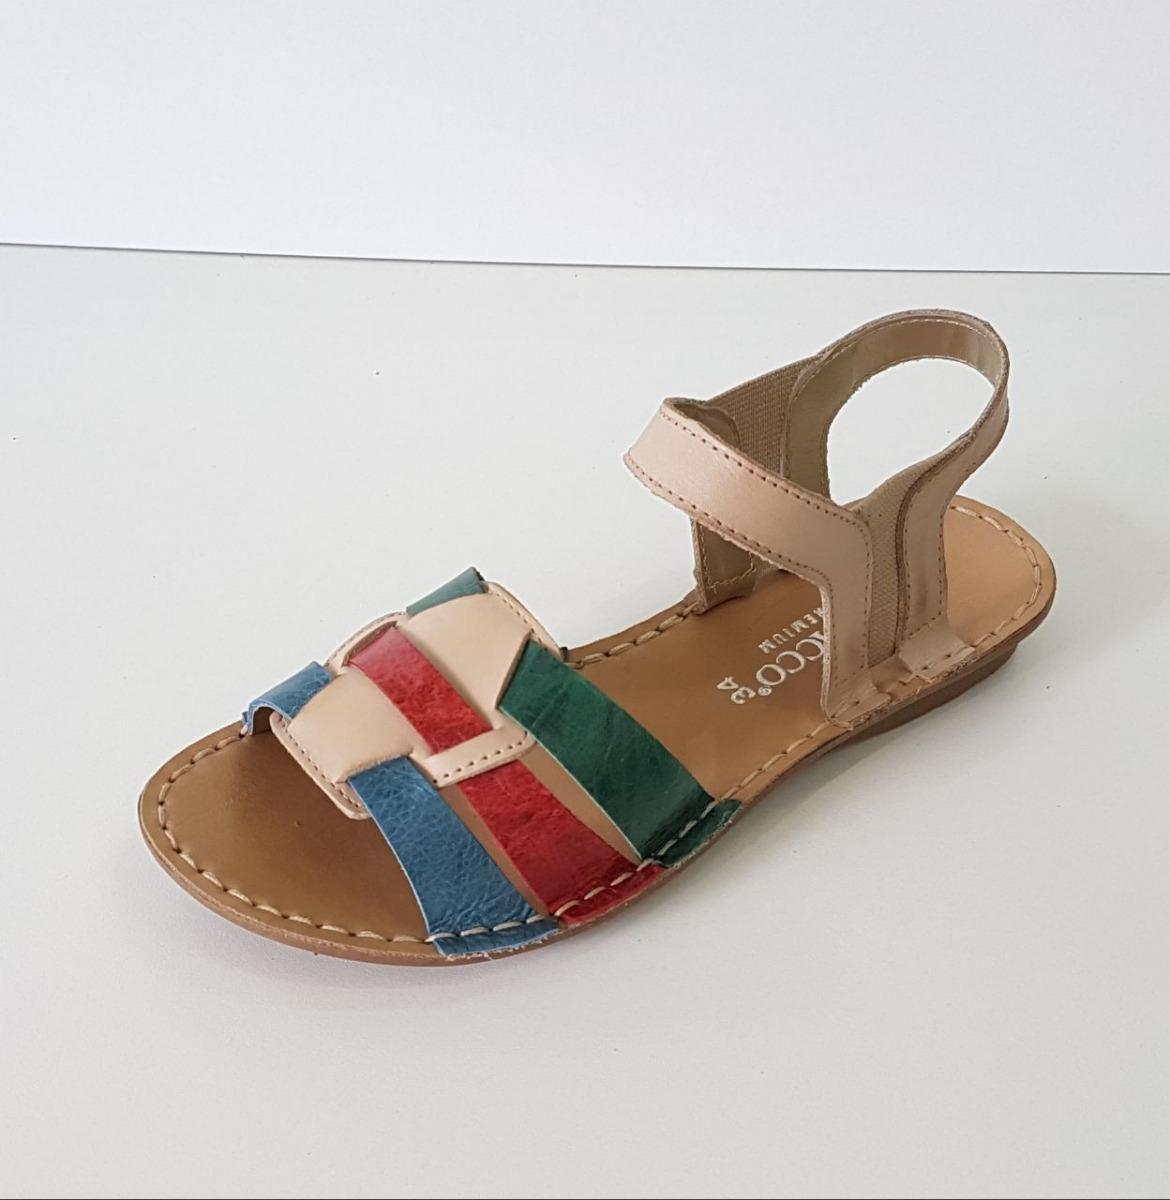 88588c813 sandália feminina andacco couro. Carregando zoom.